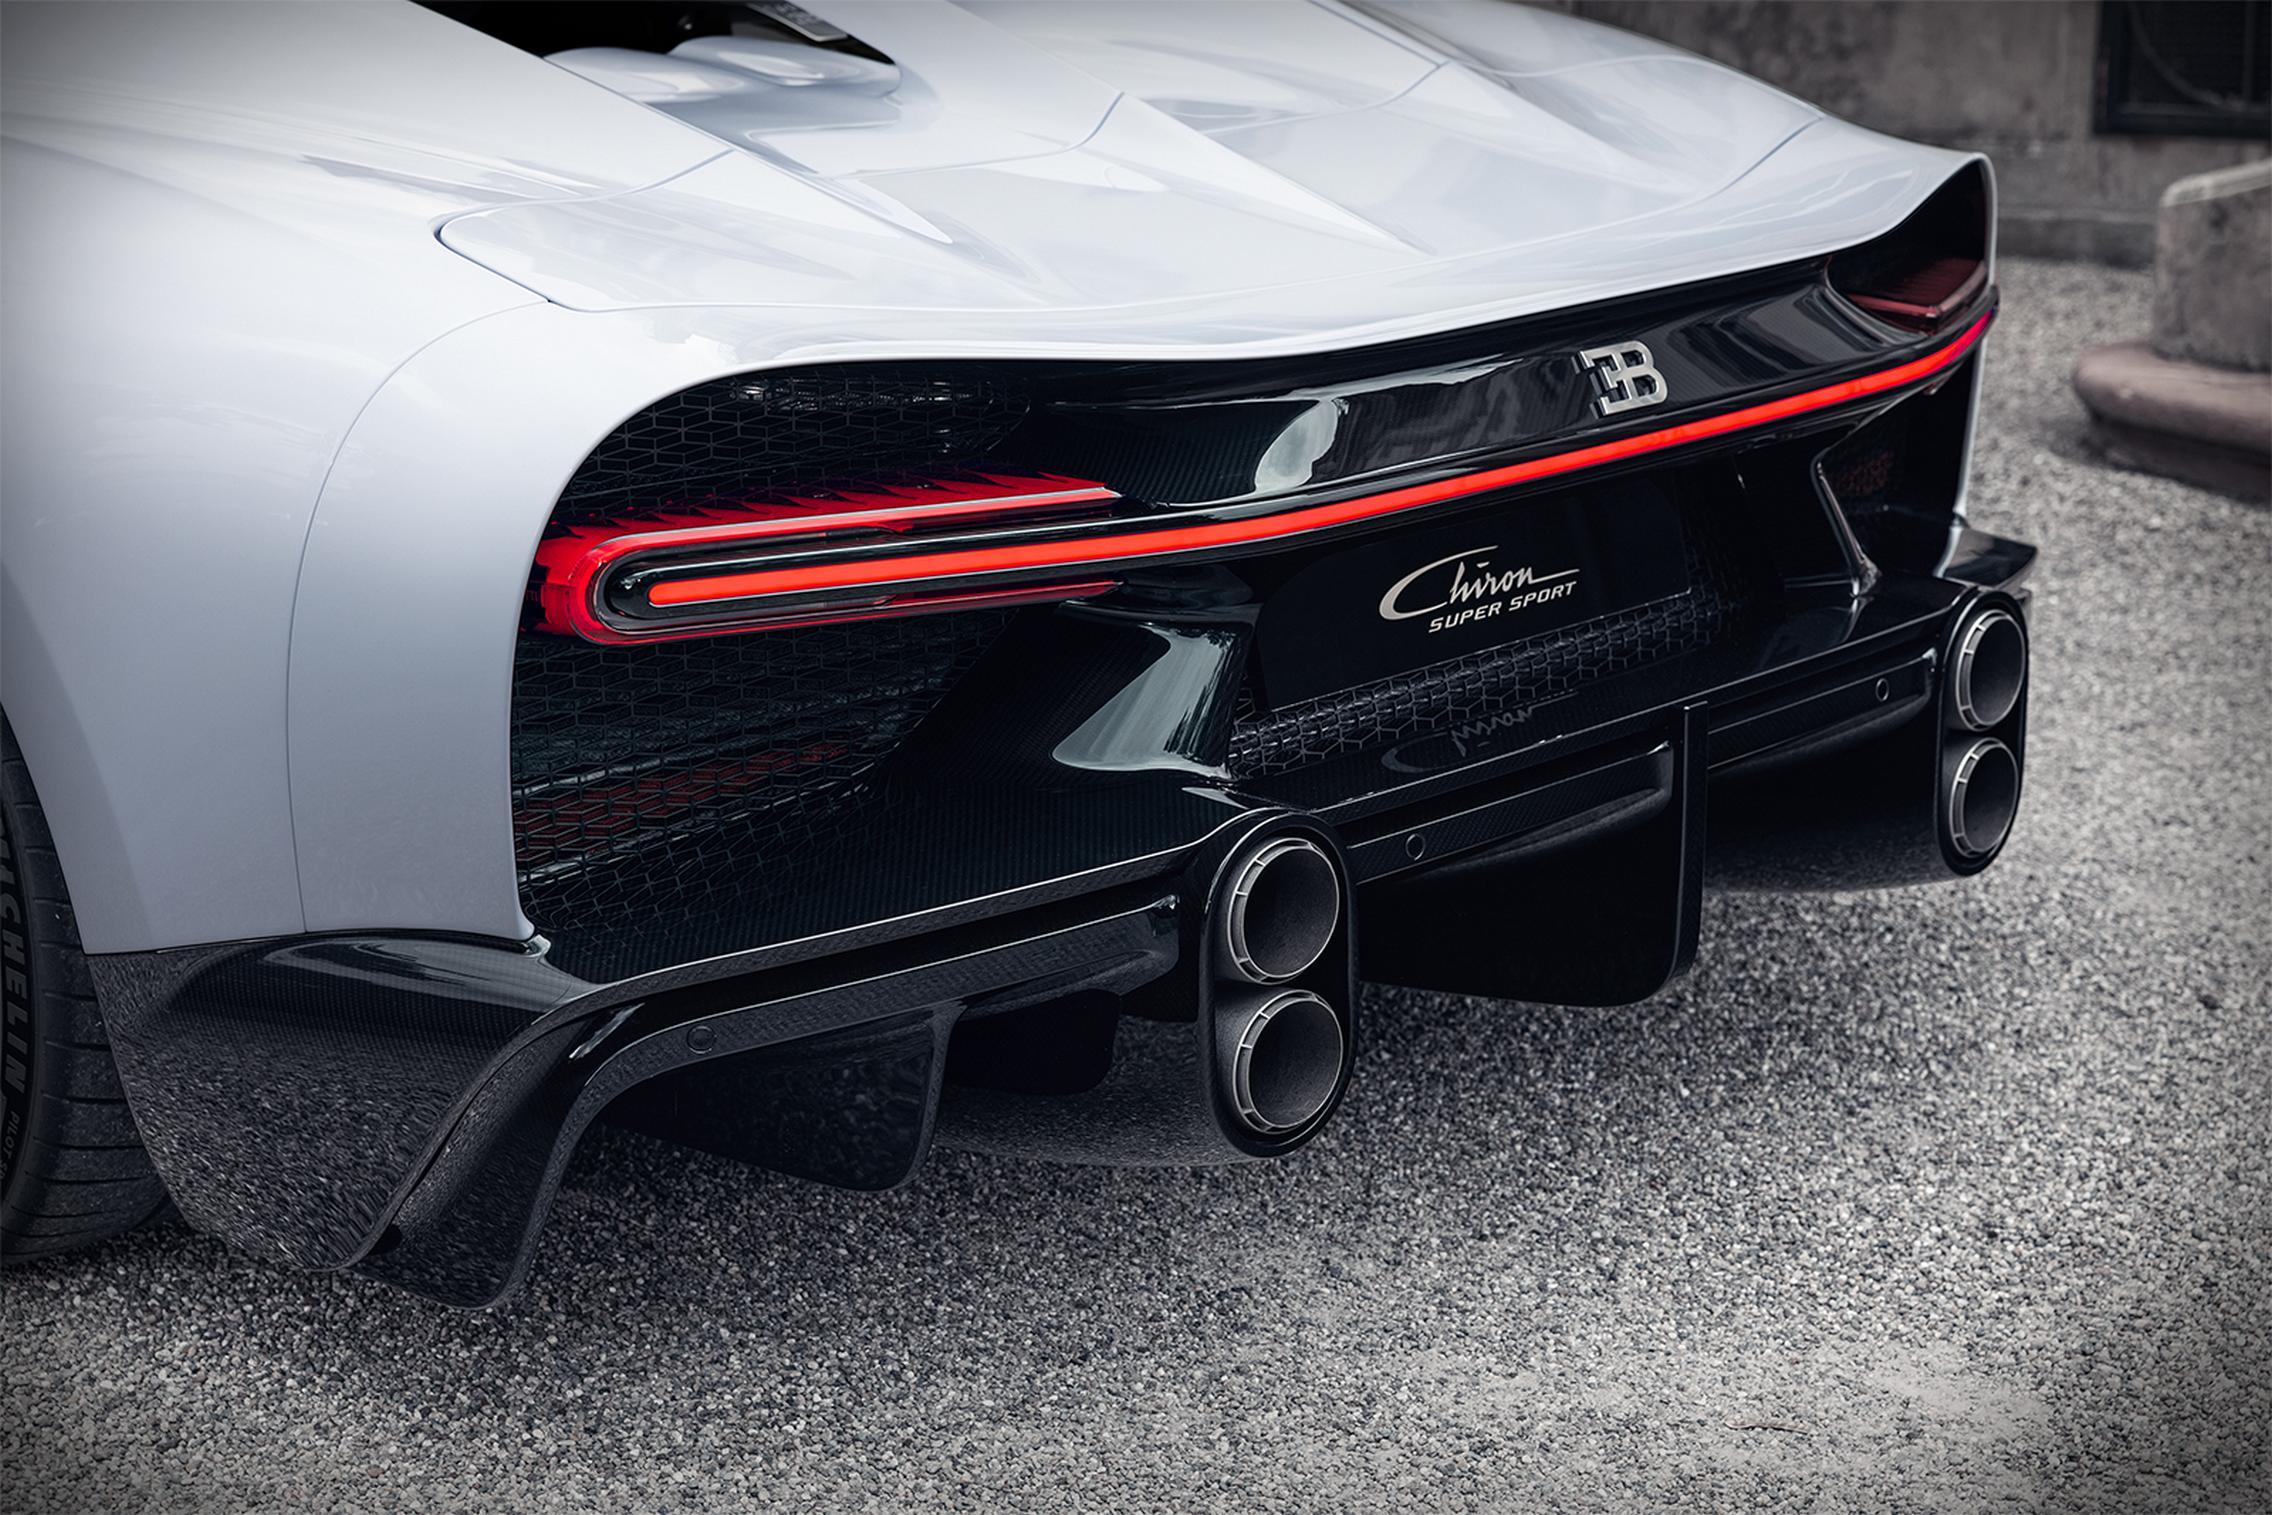 Bugatti Chiron Super Sport rear lights